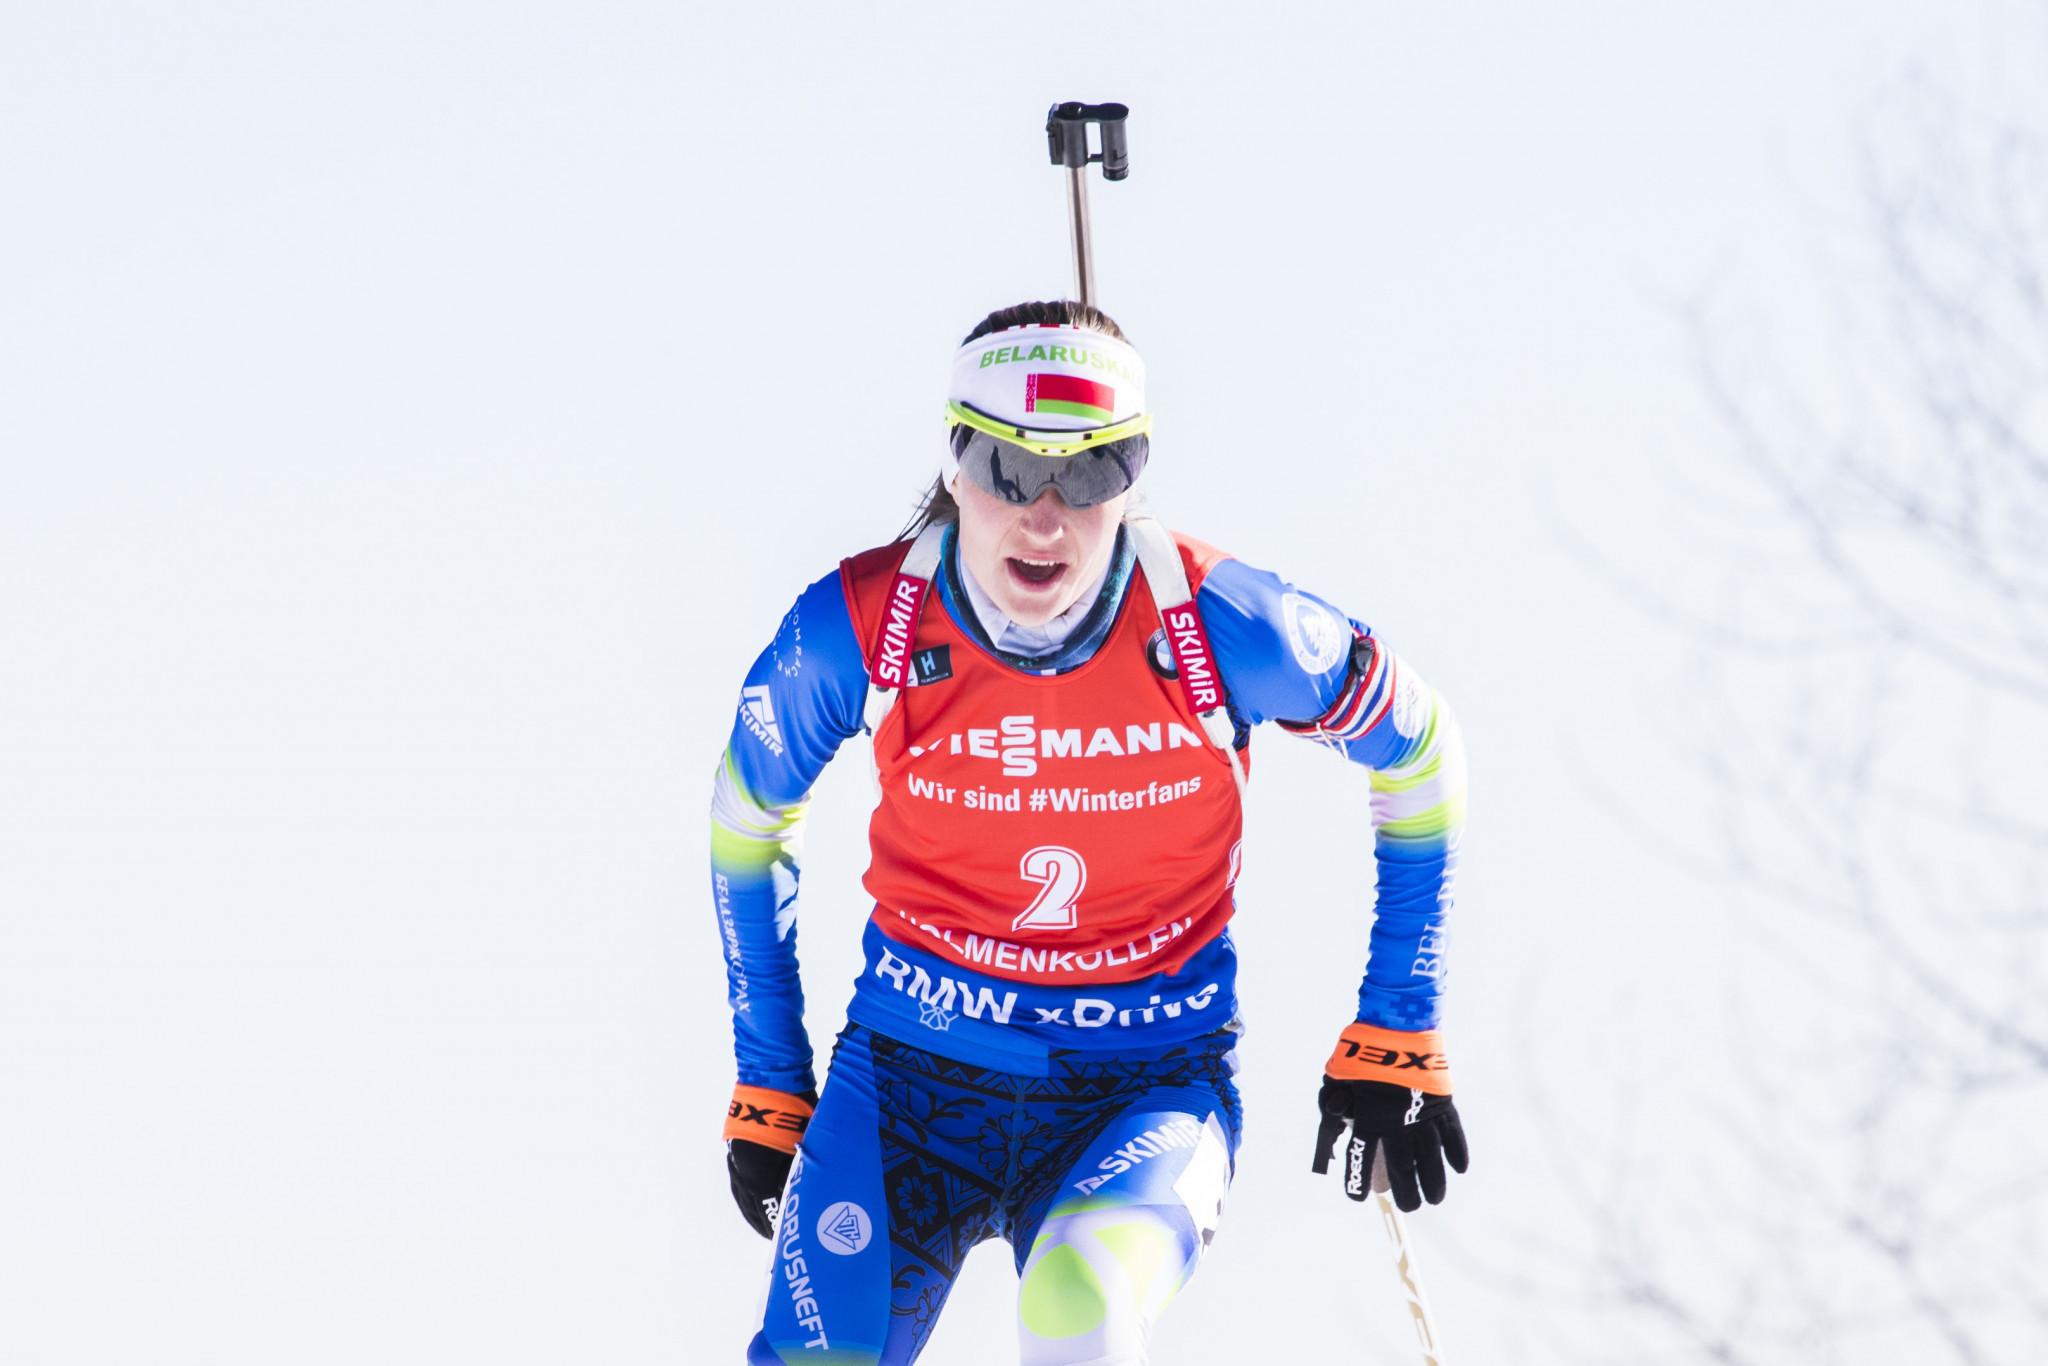 Domracheva wins at IBU World Cup Final as Kuzmina collects overall sprint crown